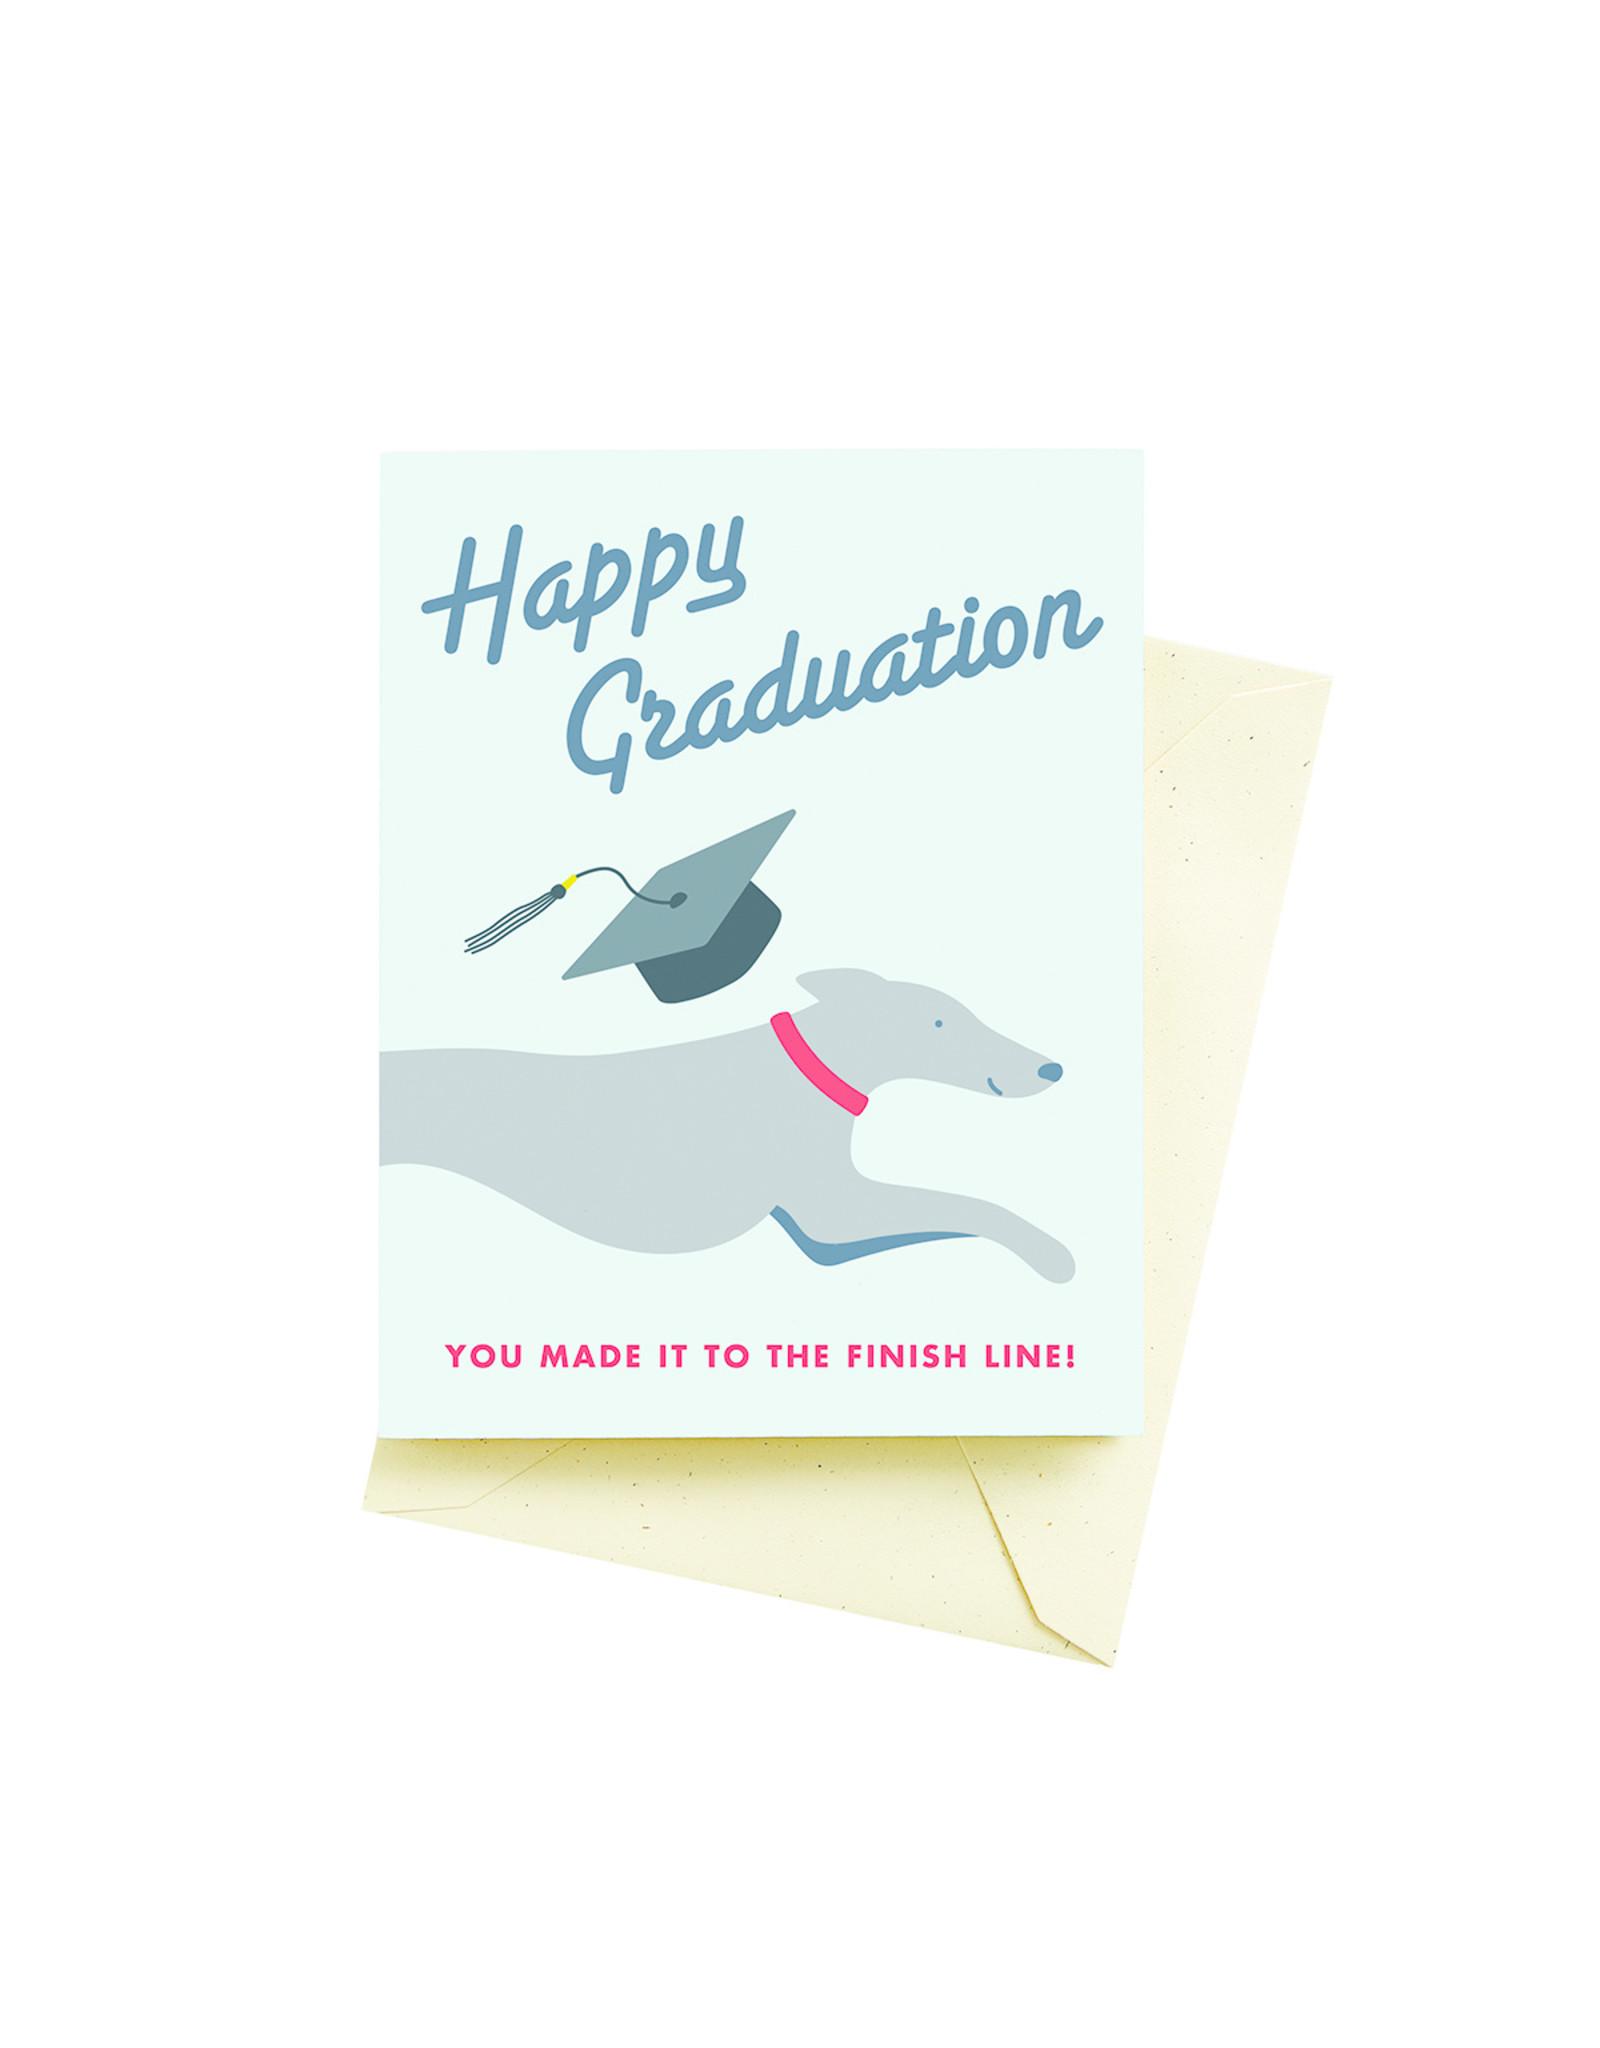 Graduation Card: Made the Finish!